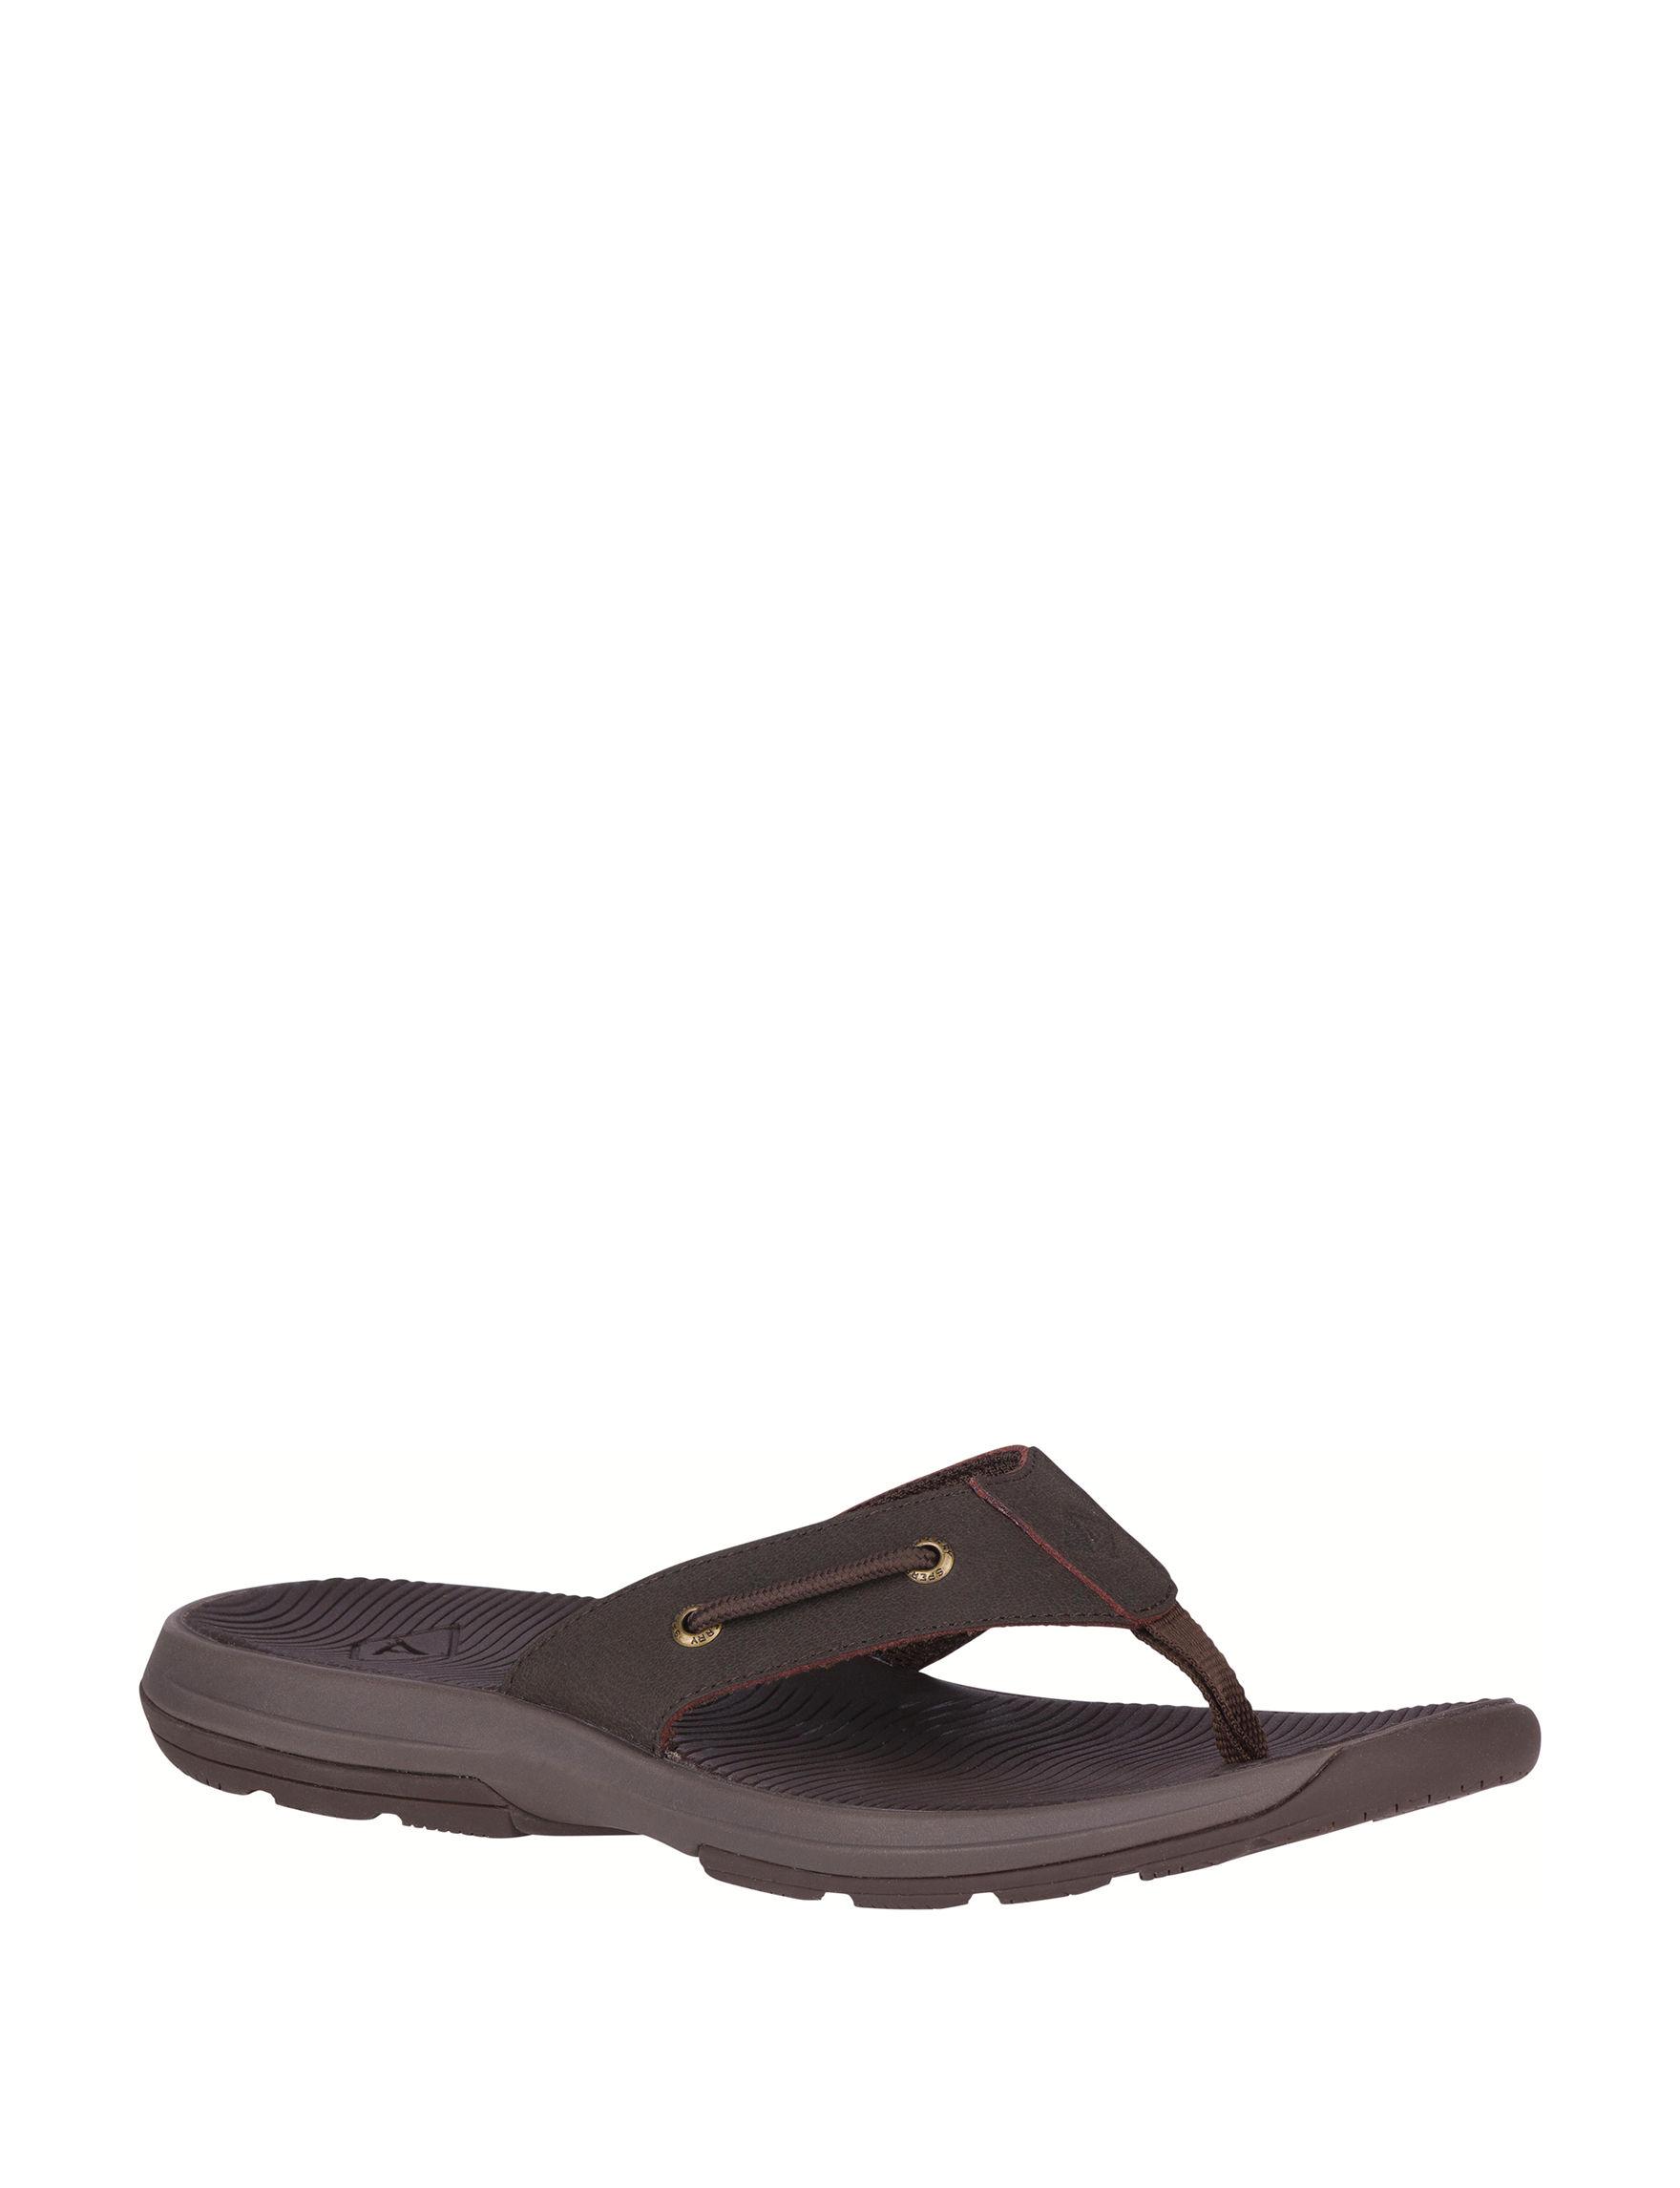 Sperry Brown Flip Flops